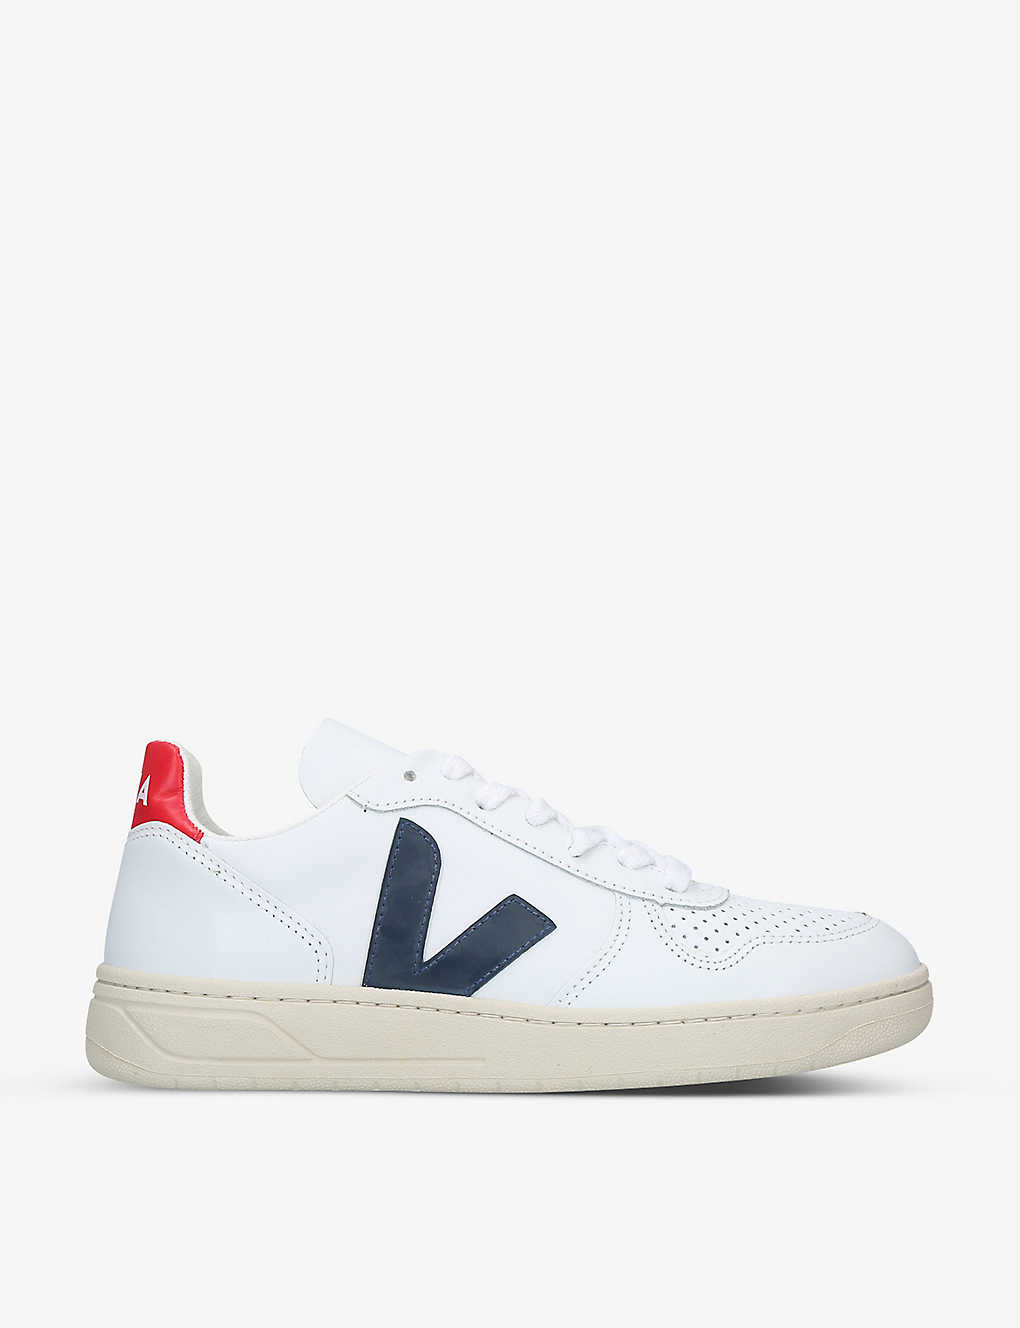 online store 4de8b 9ffdd VEJA V10 leather trainers